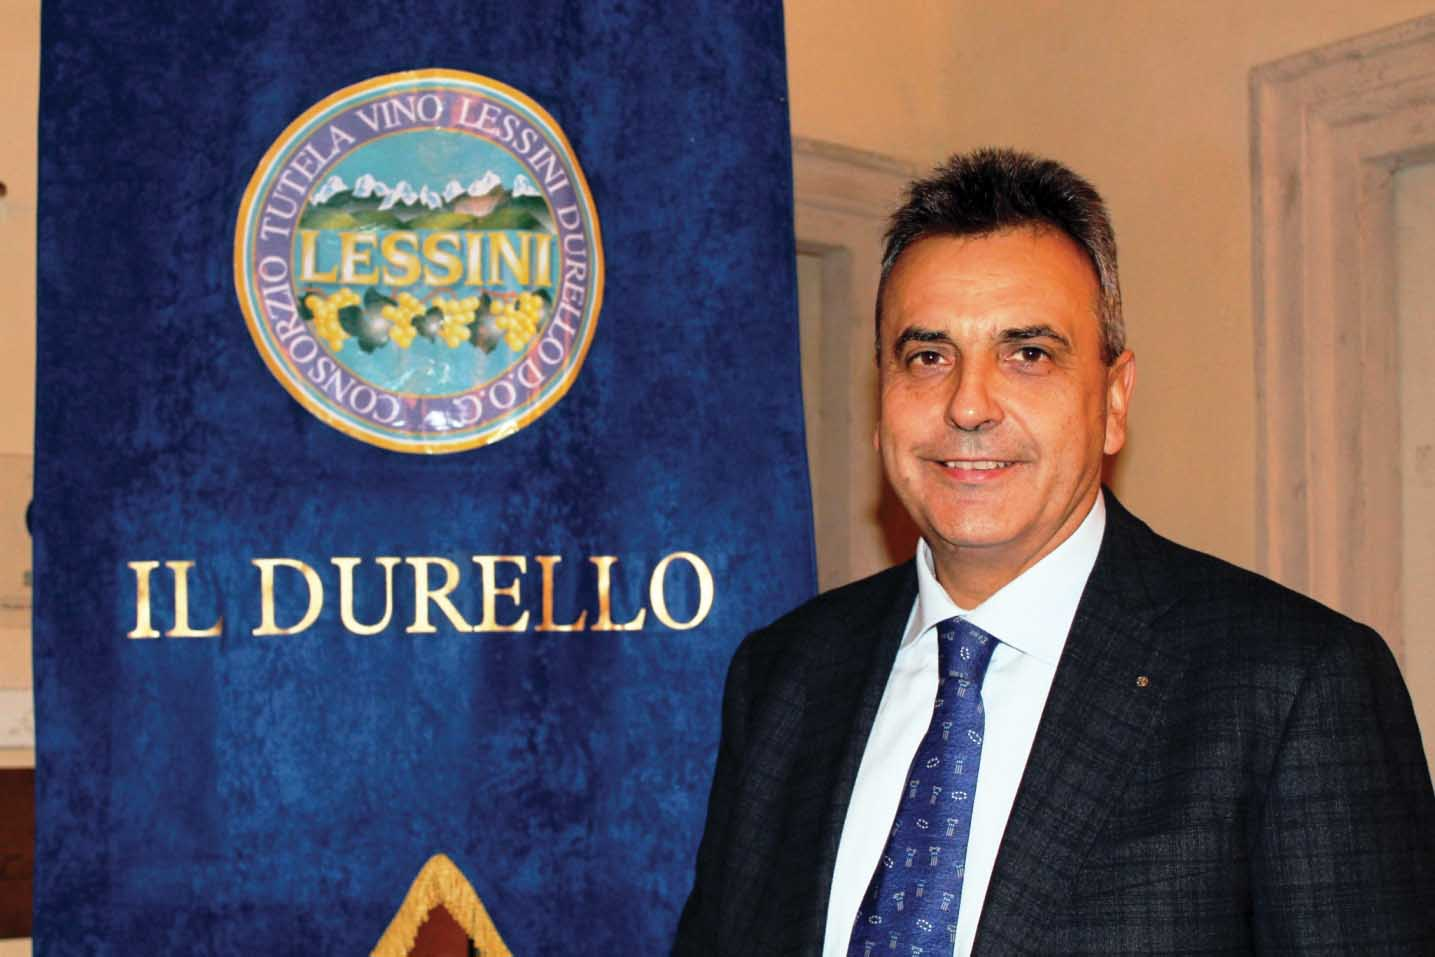 Durello soave presidente Bruno Trentini 1